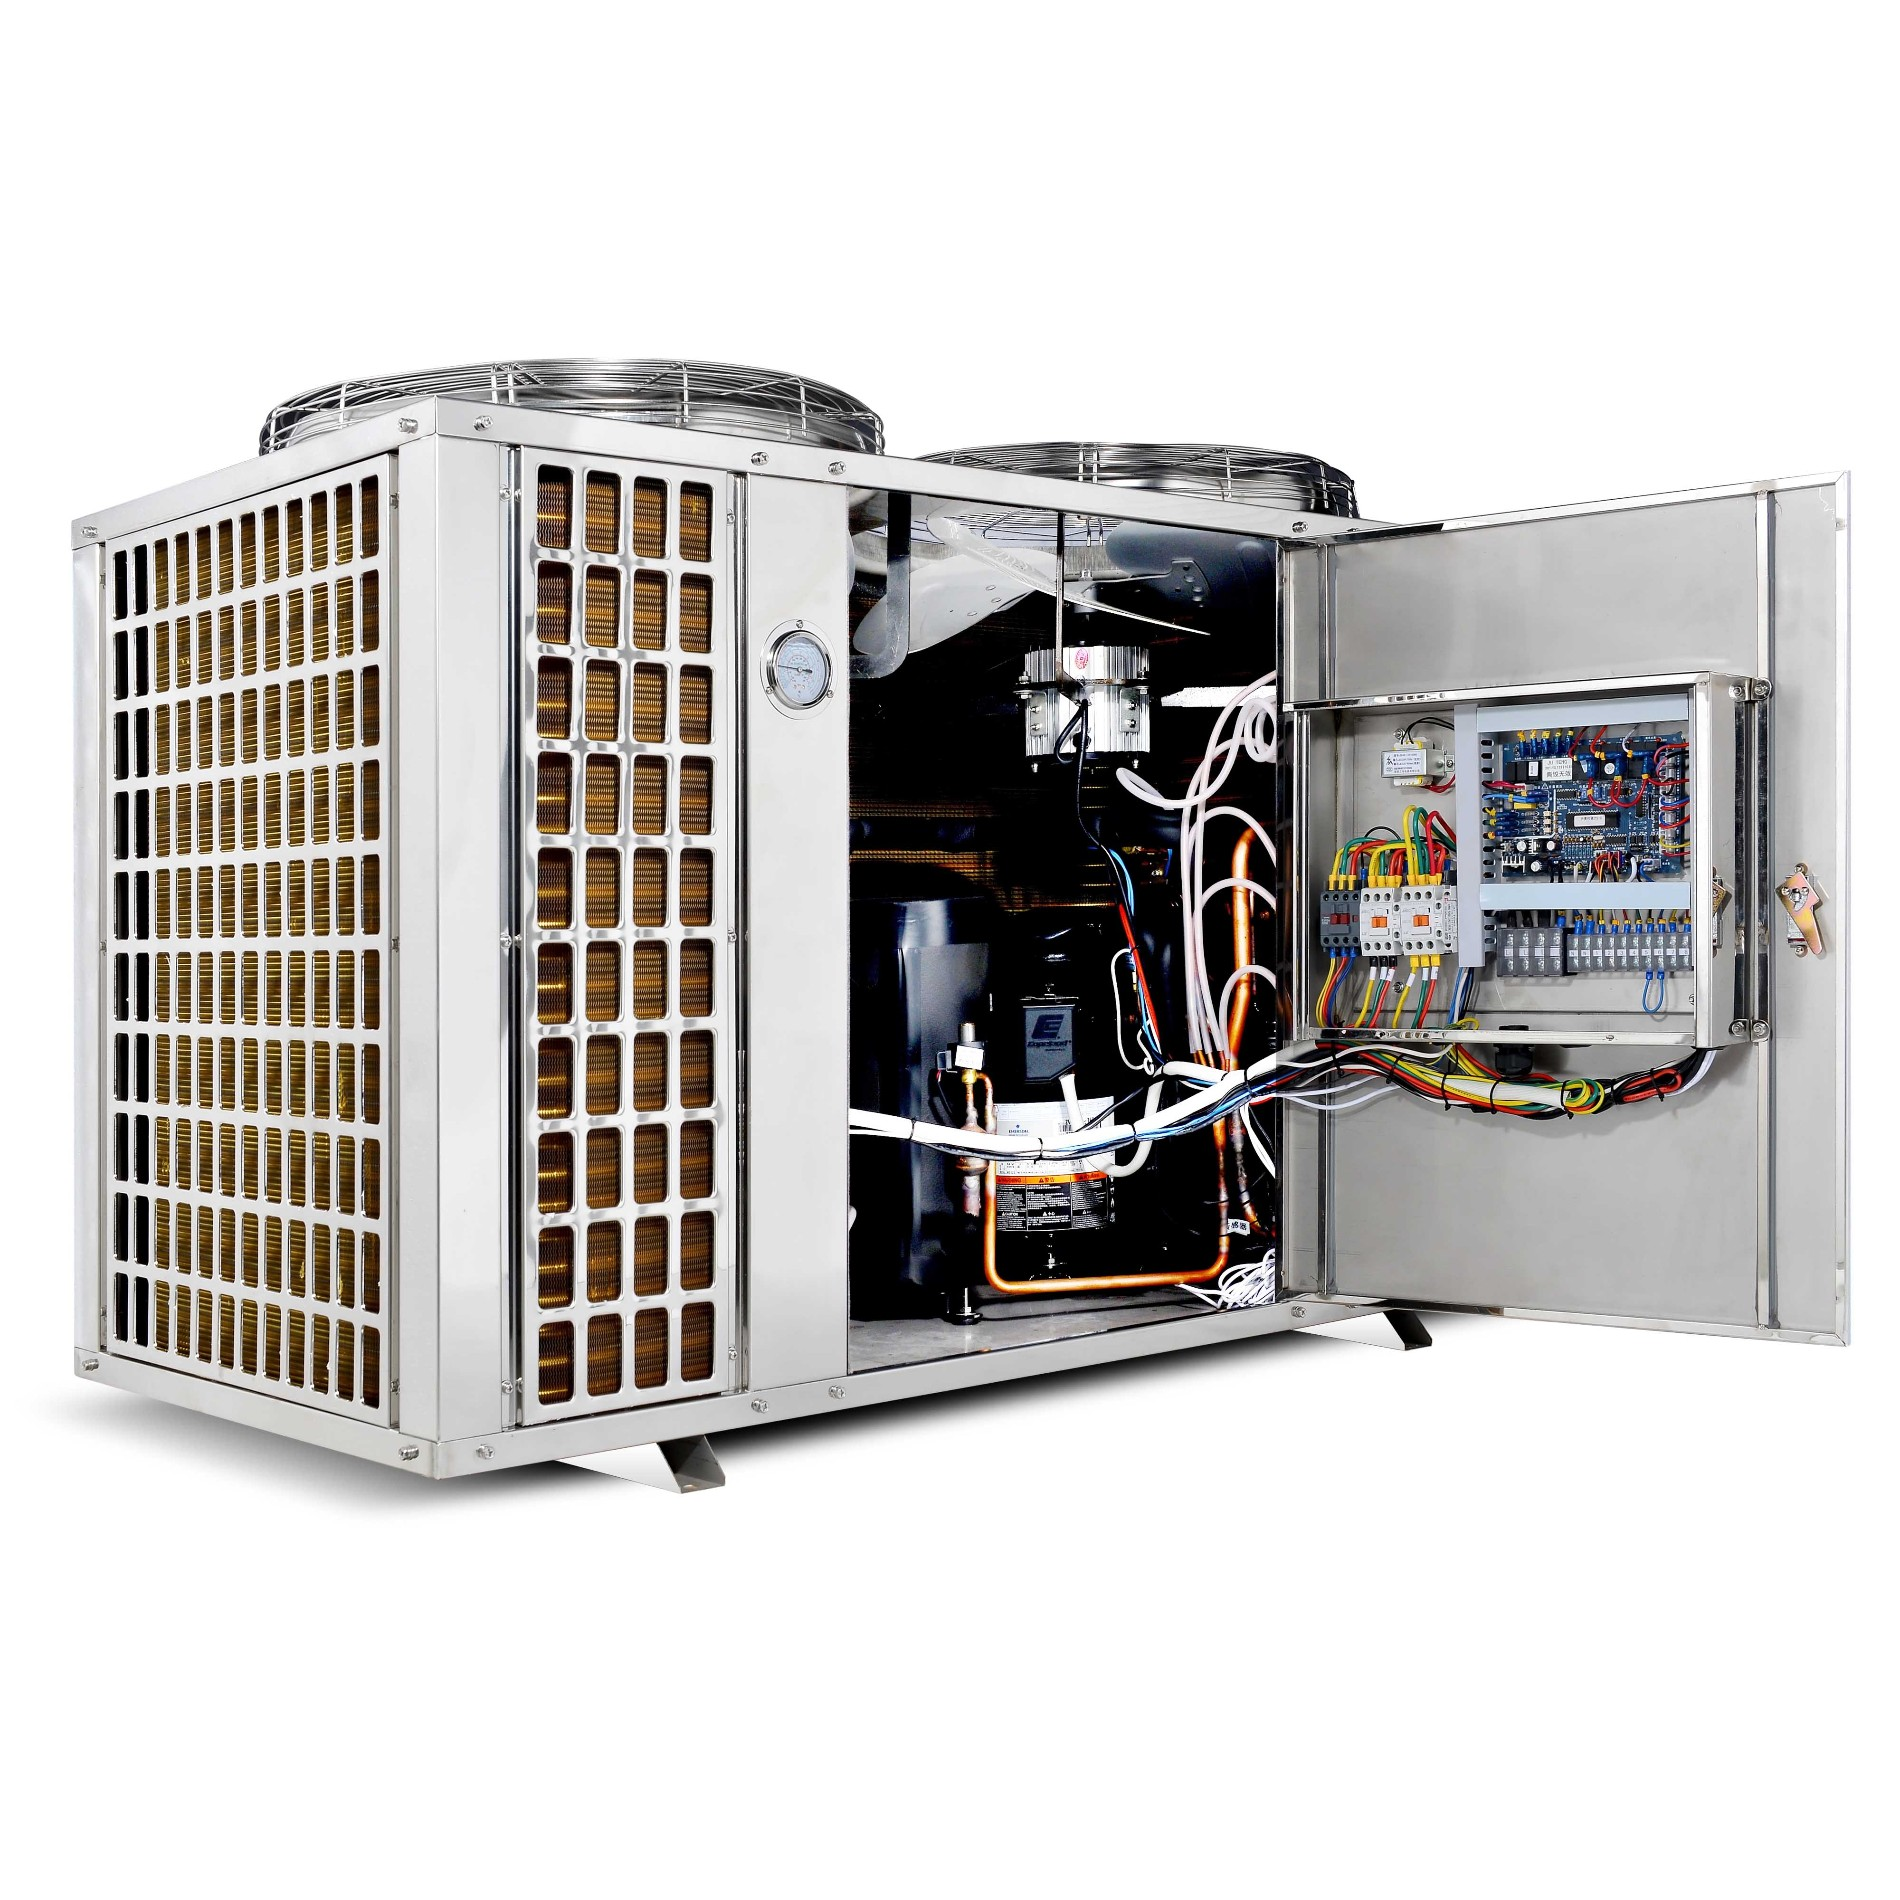 High quality energy saving techology  Industrial High Temp 90℃ Heat Pump Quotes,China heat pump equipment Industrial High Temp 90℃ Heat Pump Factory, pump equipmentIndustrial High Temp 90℃ Heat Pump Purchasing